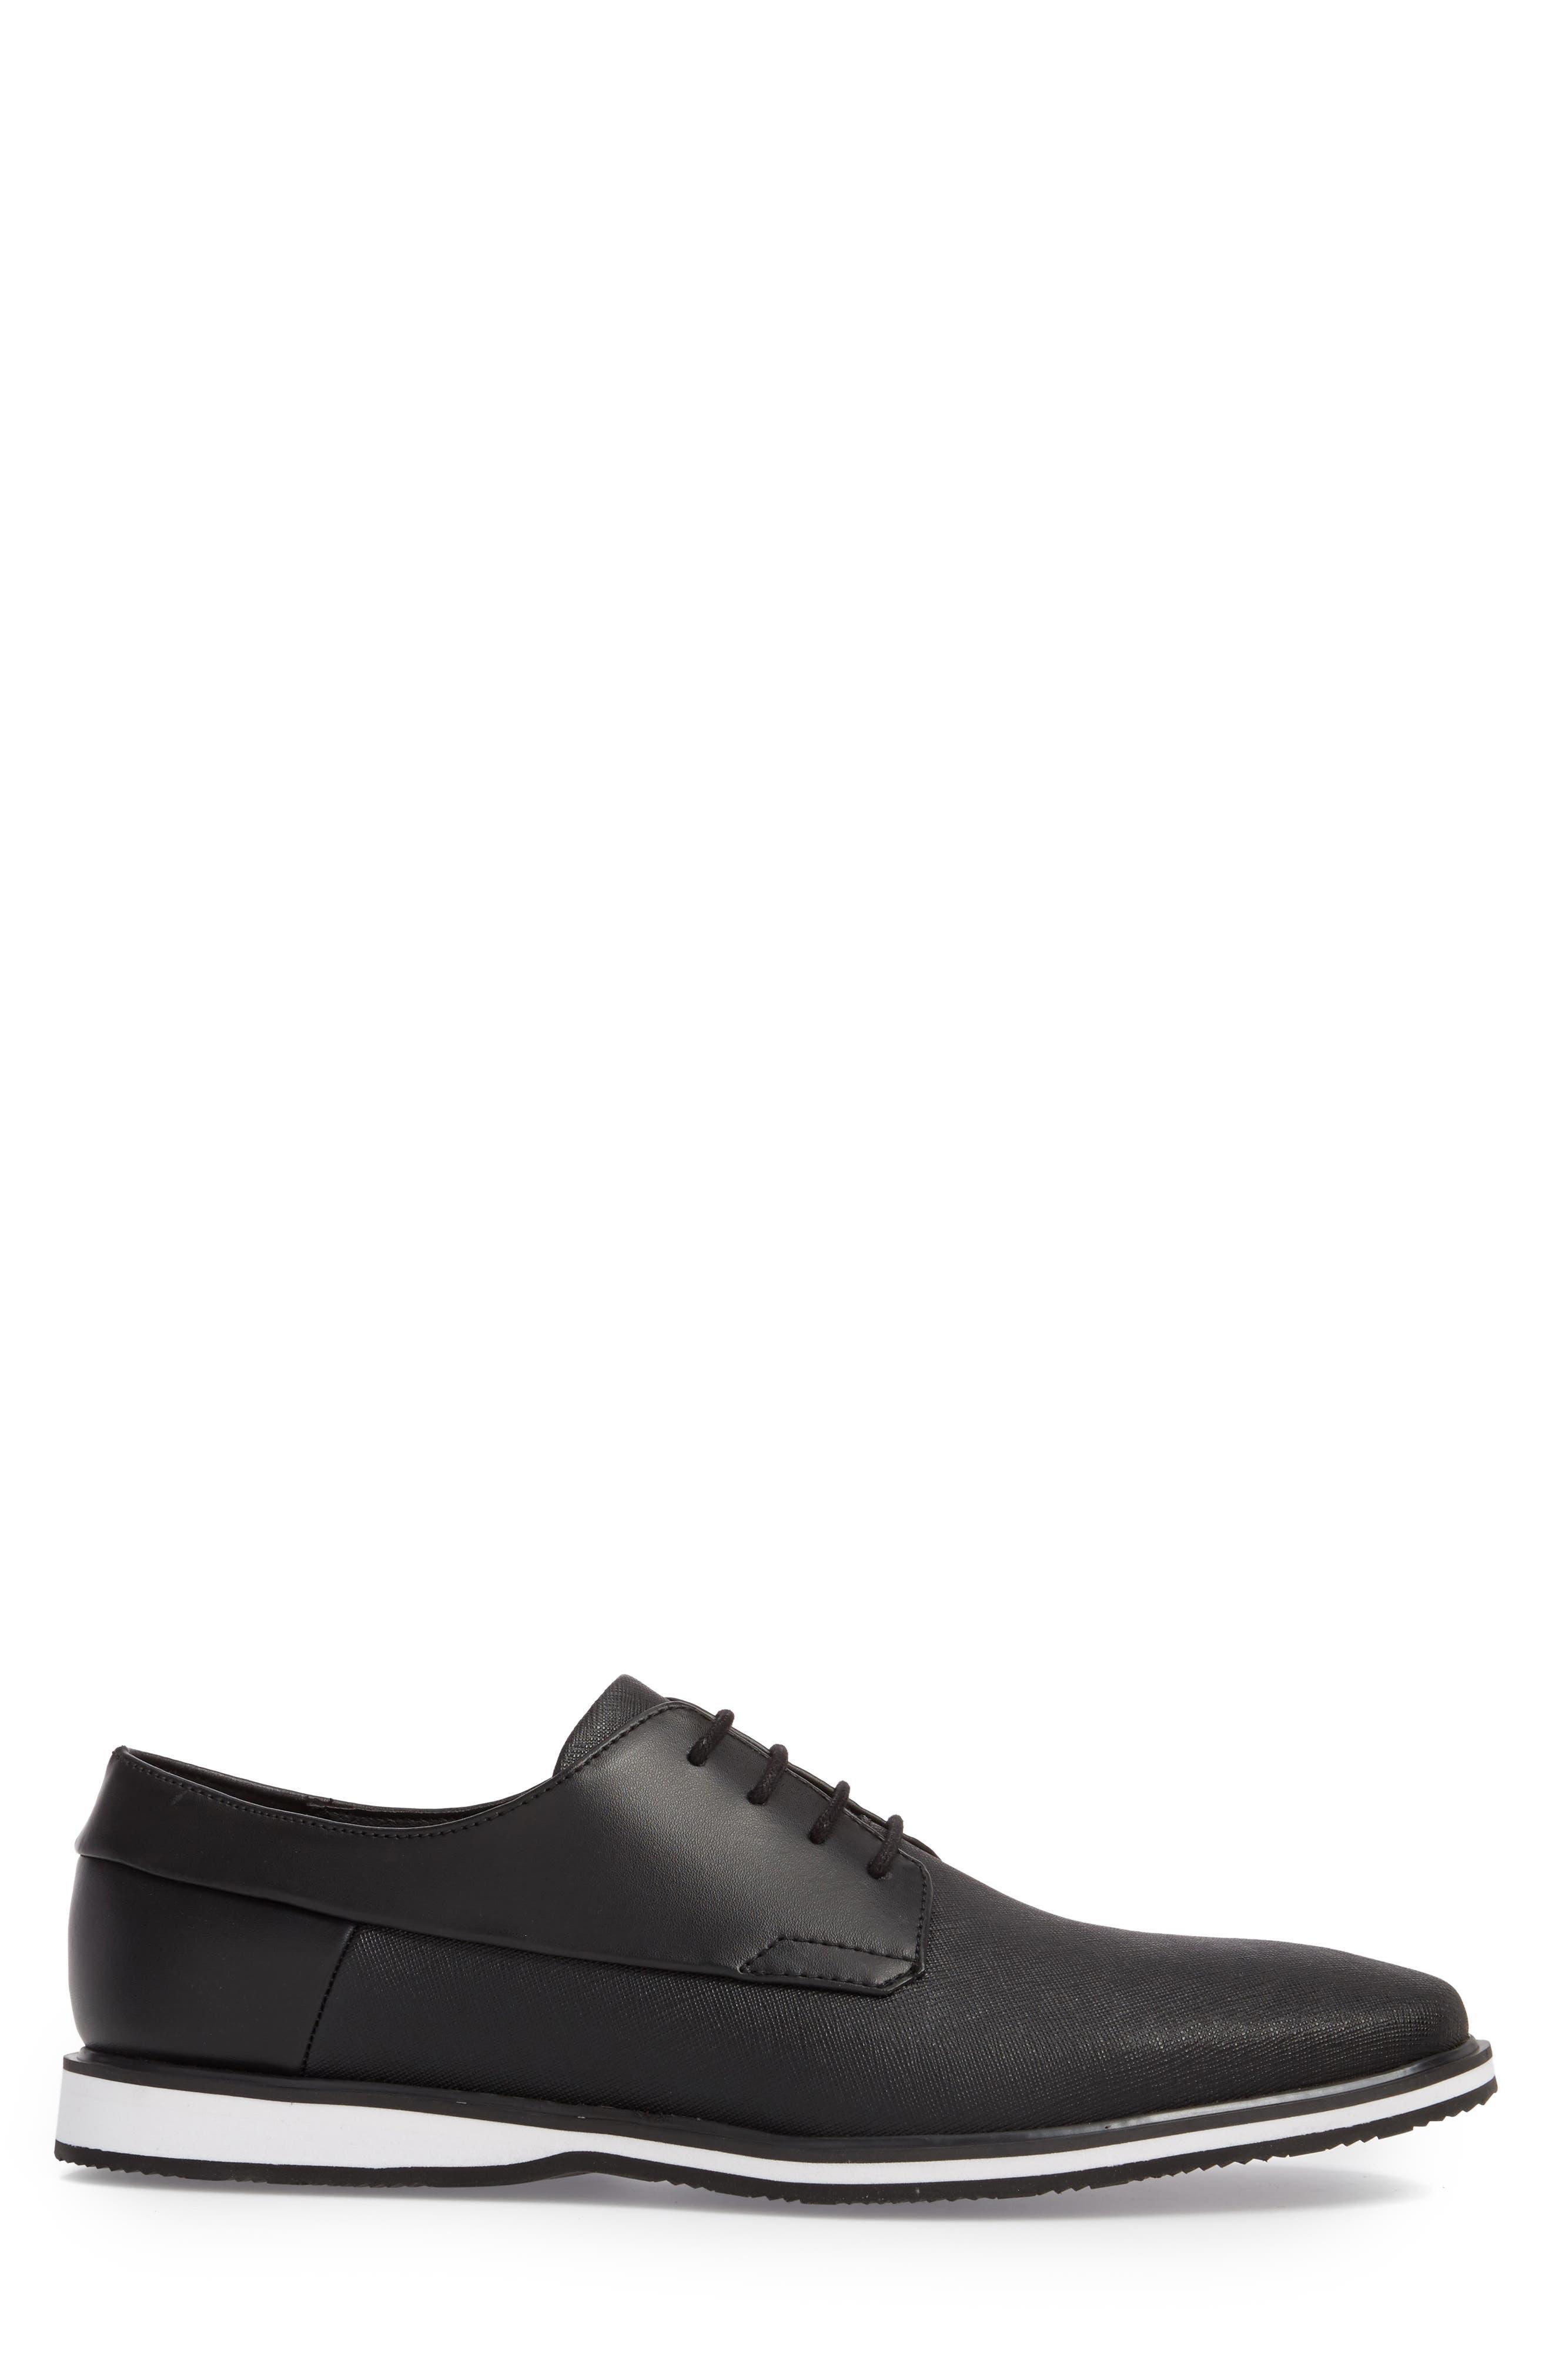 Wilfred Plain Toe Derby,                             Alternate thumbnail 3, color,                             Black